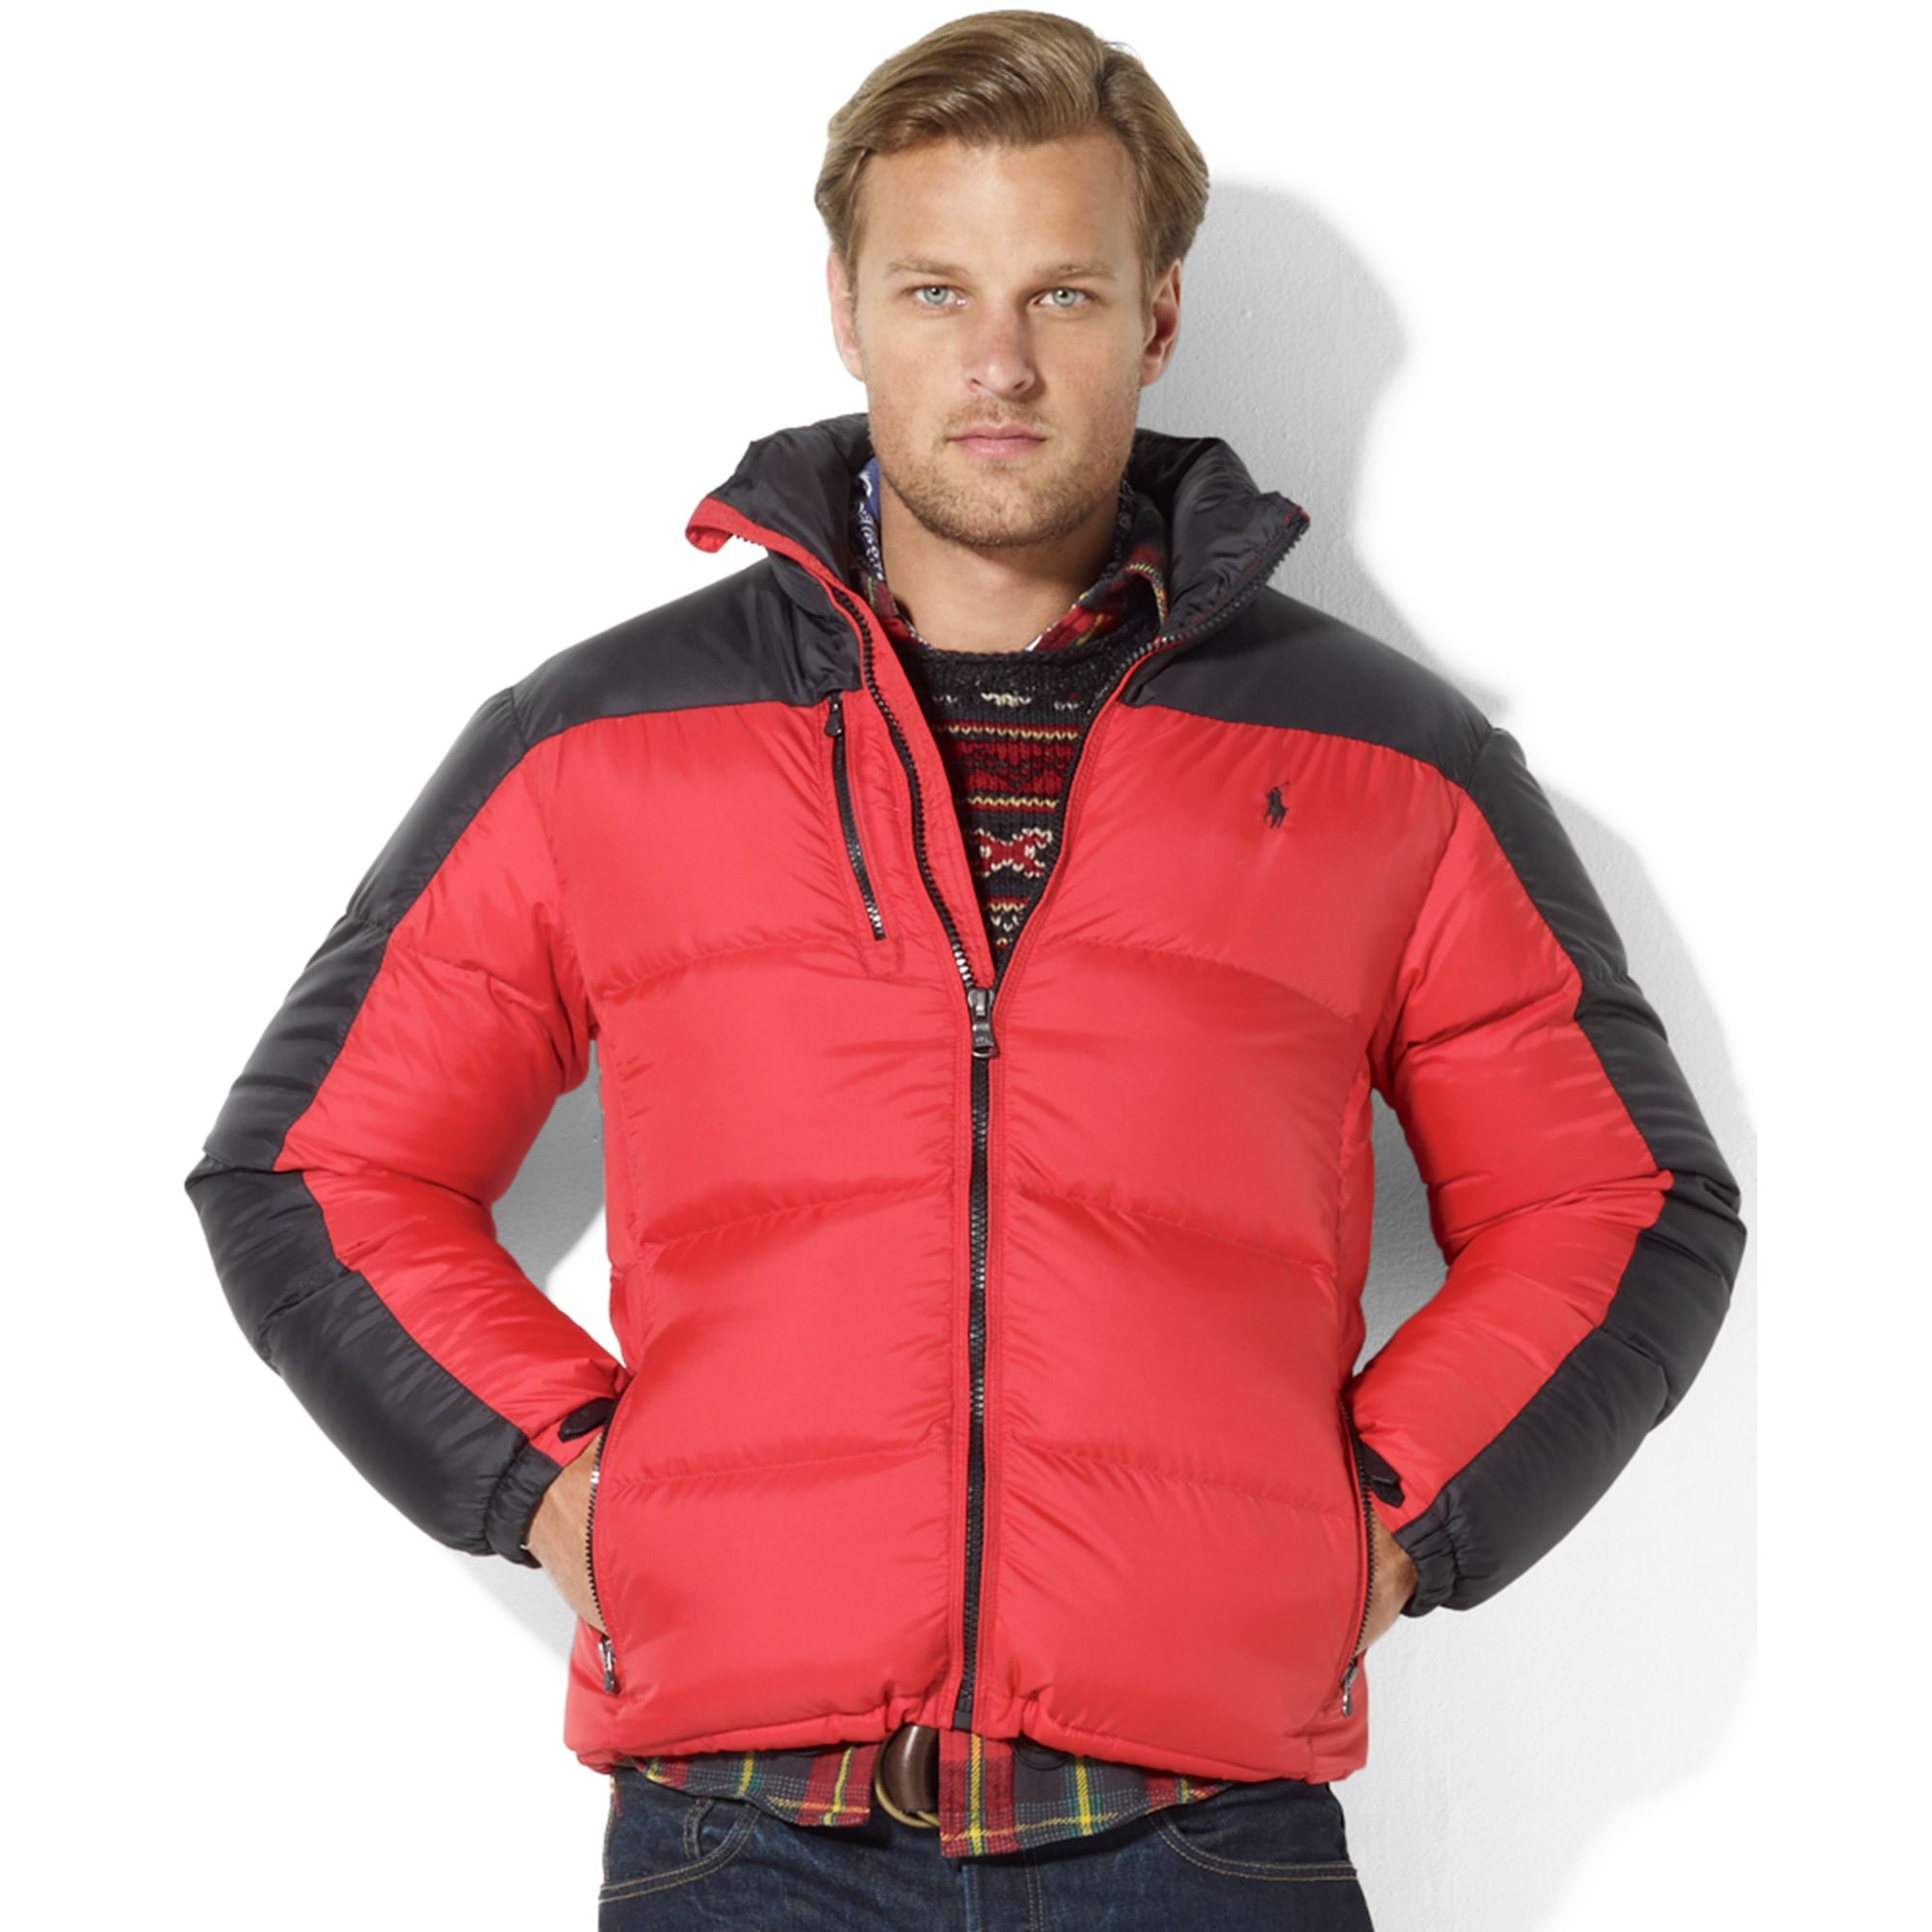 836649b359b3 Lyst - Ralph Lauren Snow Polo Core Trek Down Jacket in Red for Men